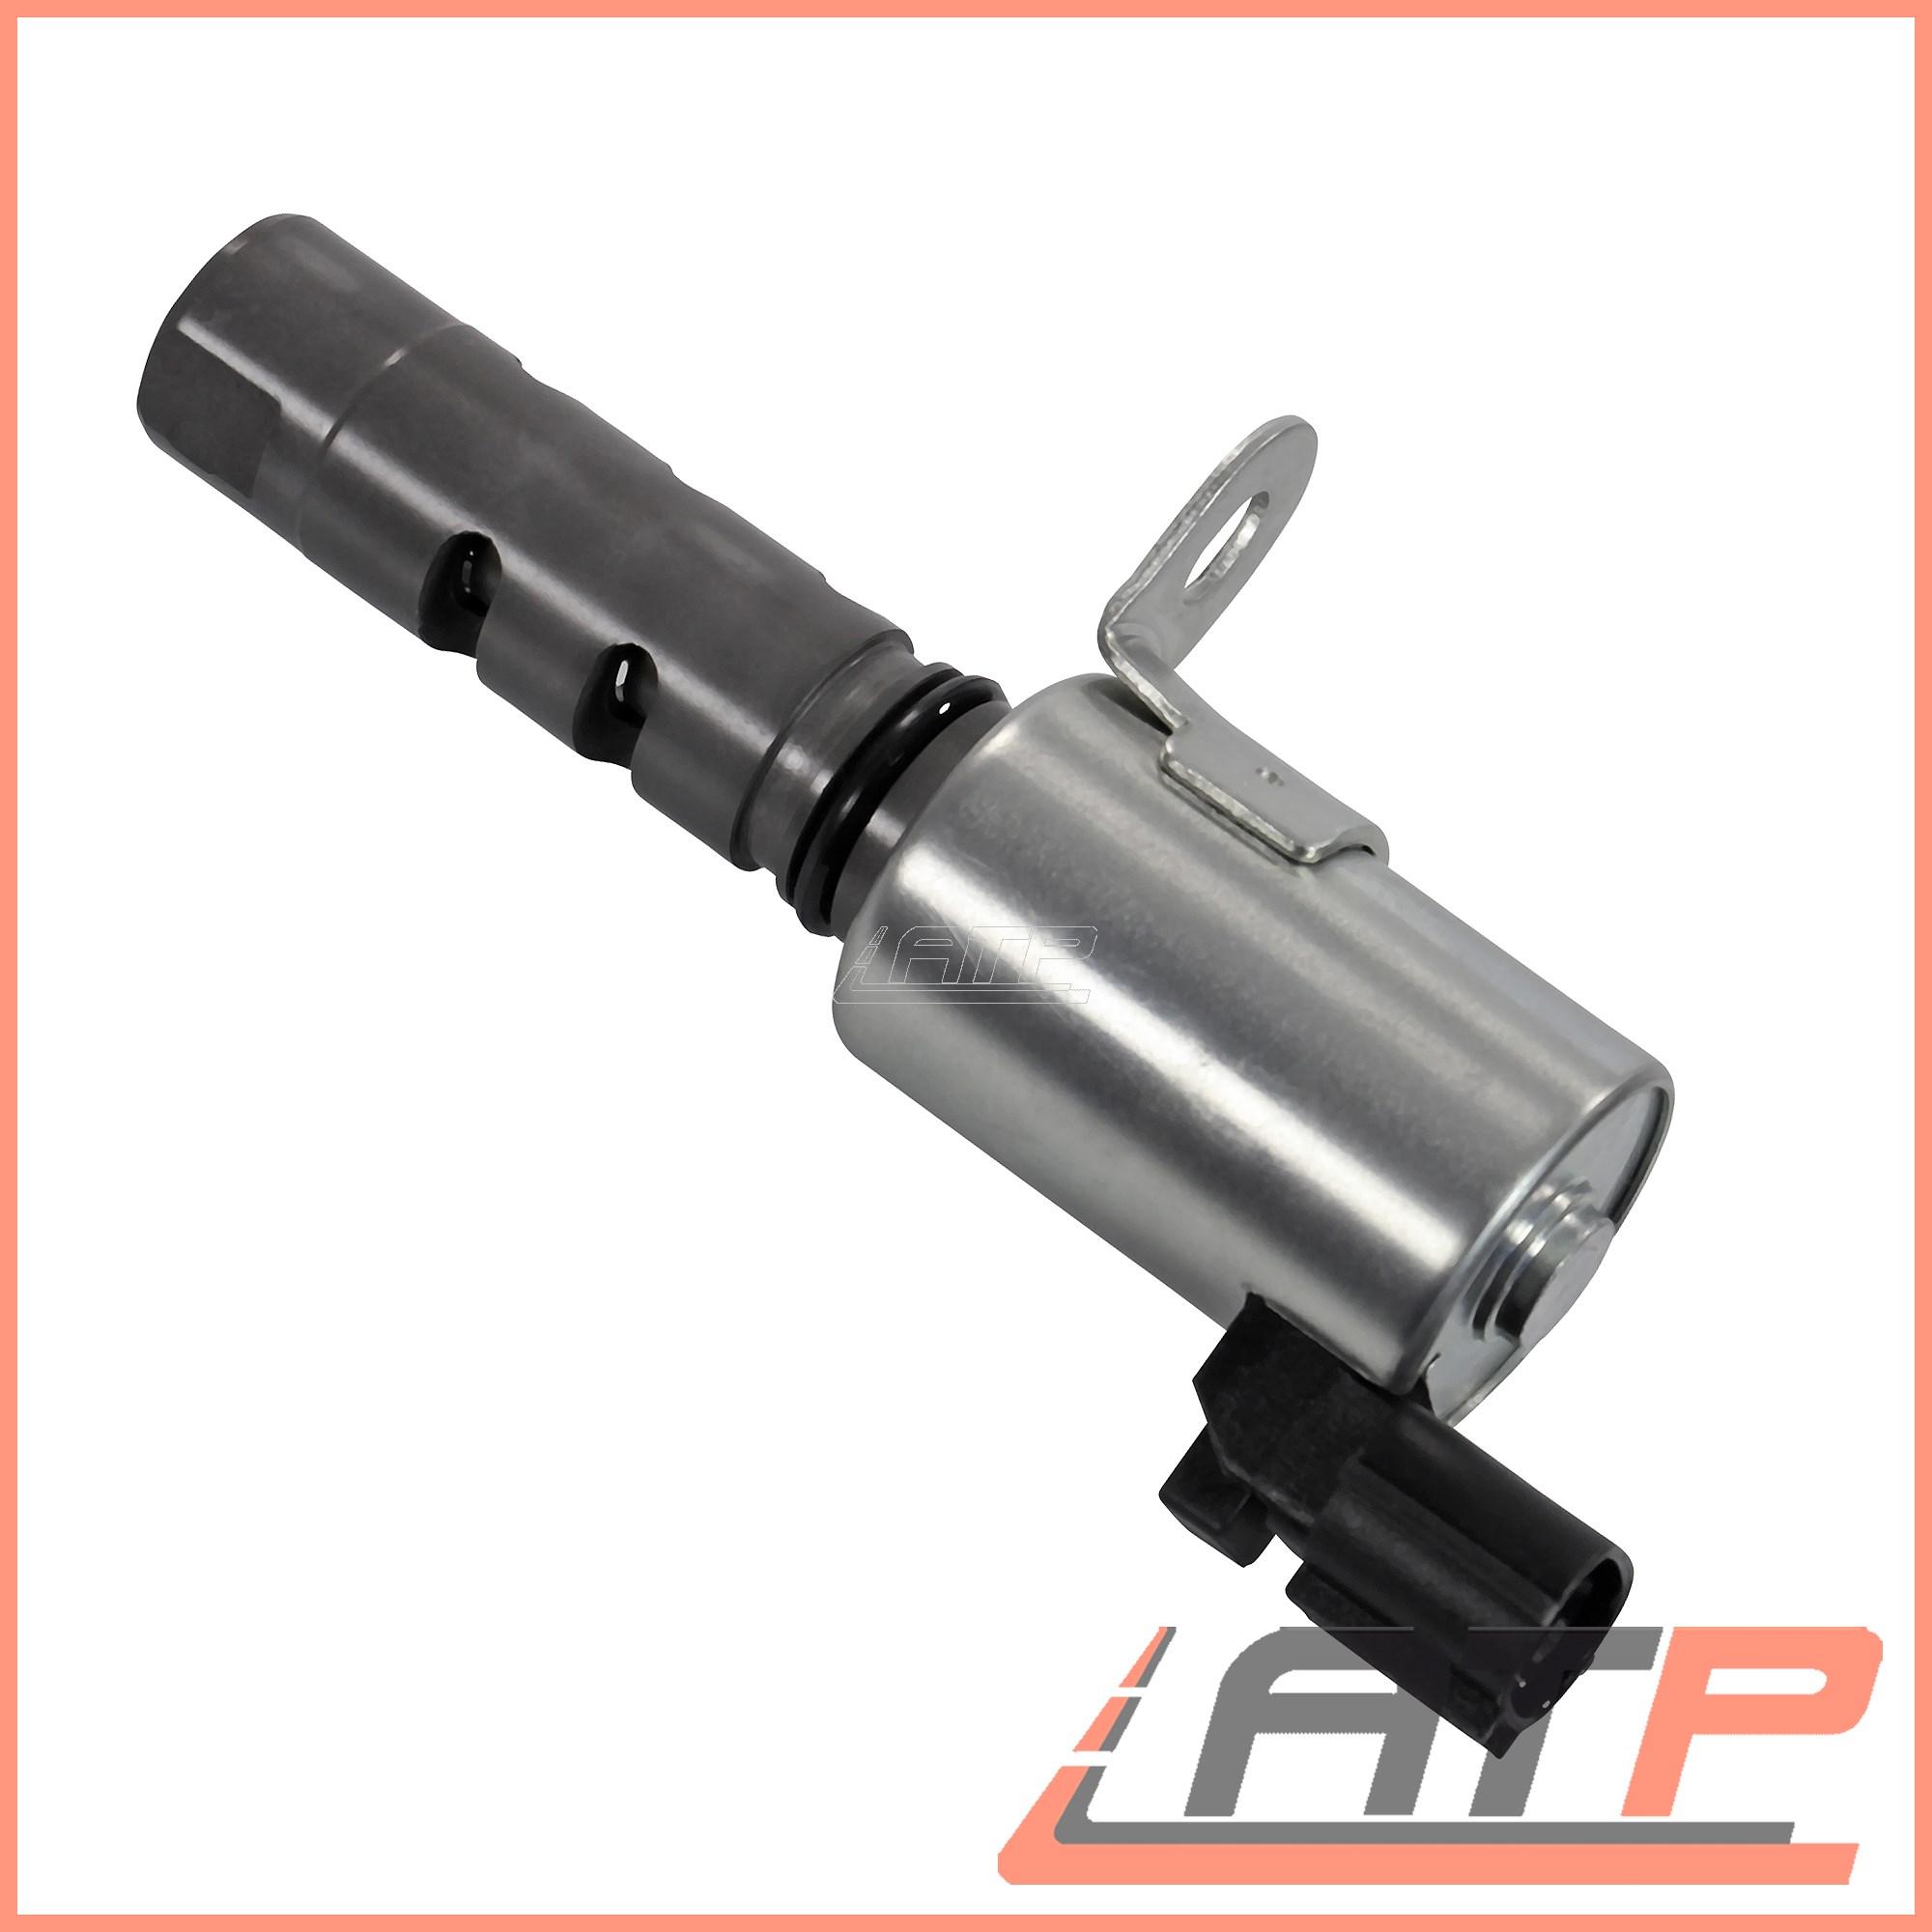 Solenoide-valvula-de-control-de-ajuste-del-arbol-de-levas-1X-Toyota-Avensis-T22-2-0-00-03 miniatura 2